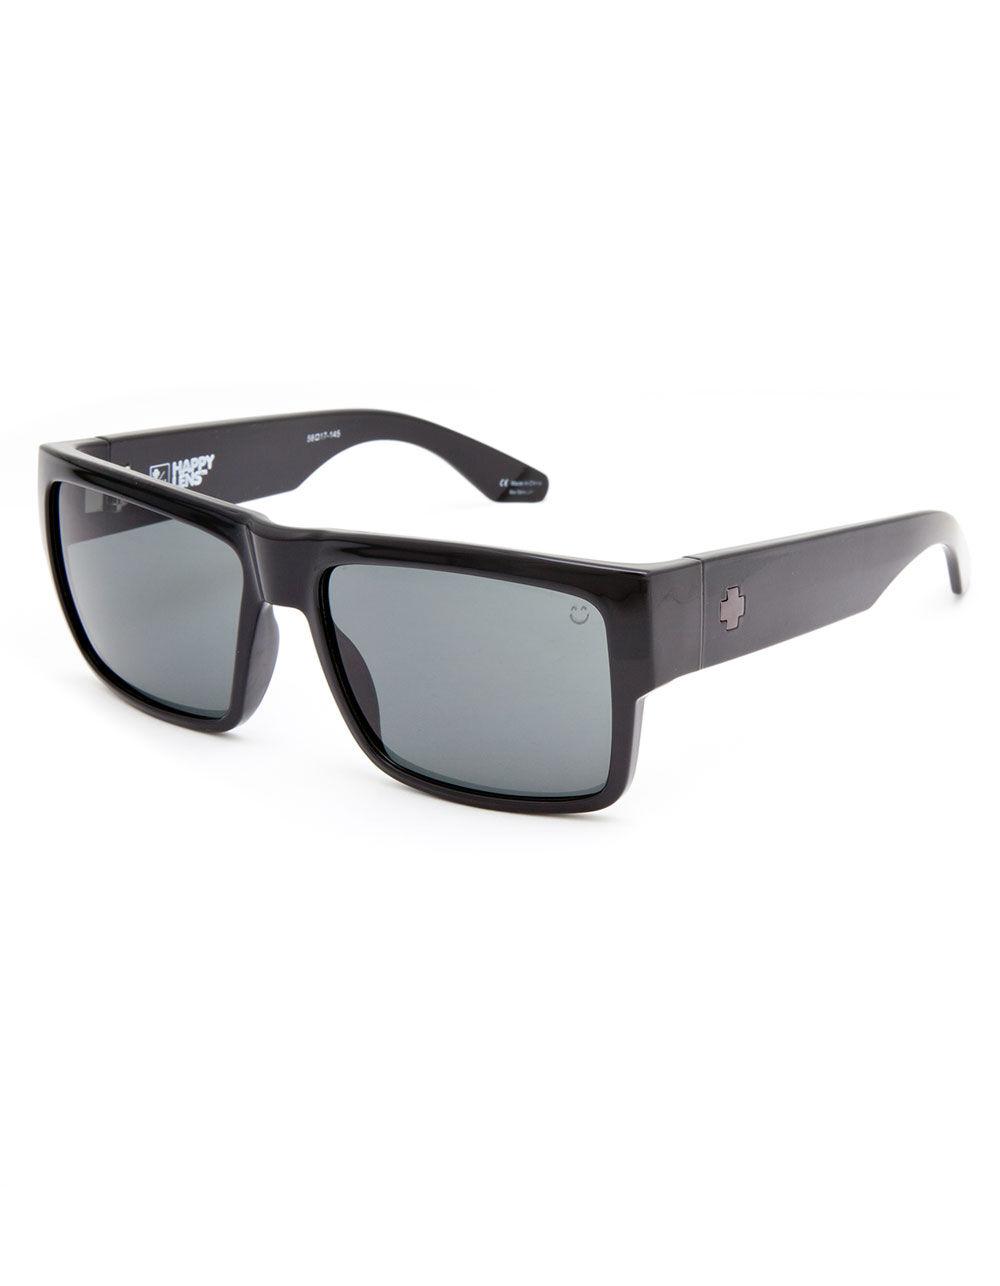 SPY Happy Lens Cyrus Sunglasses